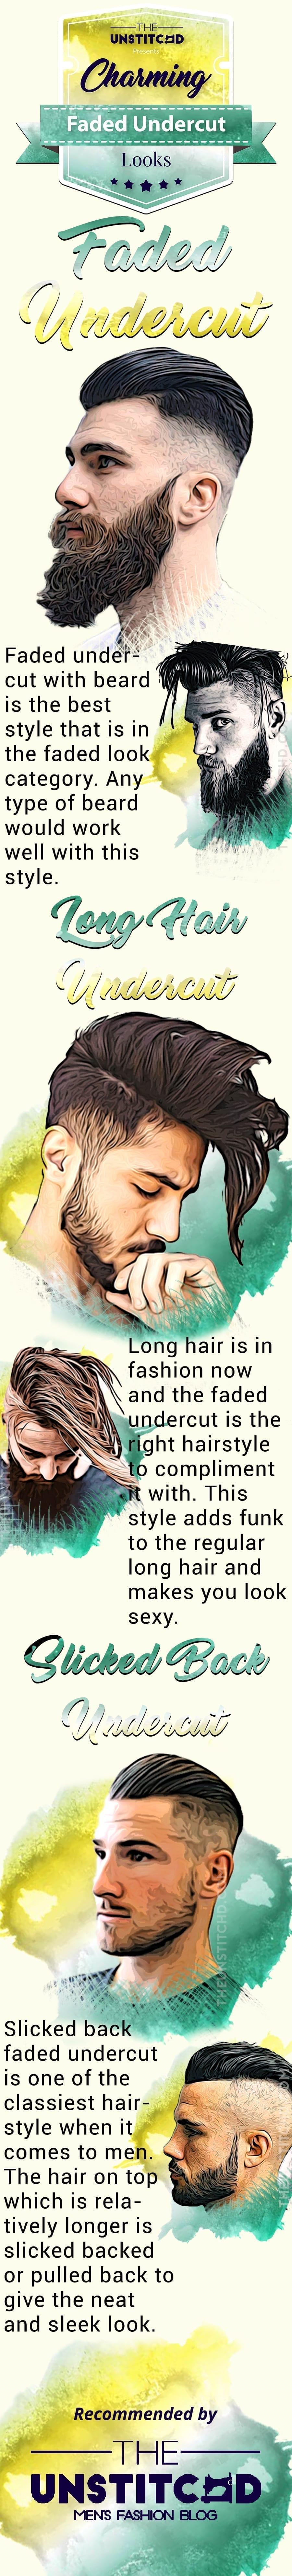 undercut-fade-hairstyle-info